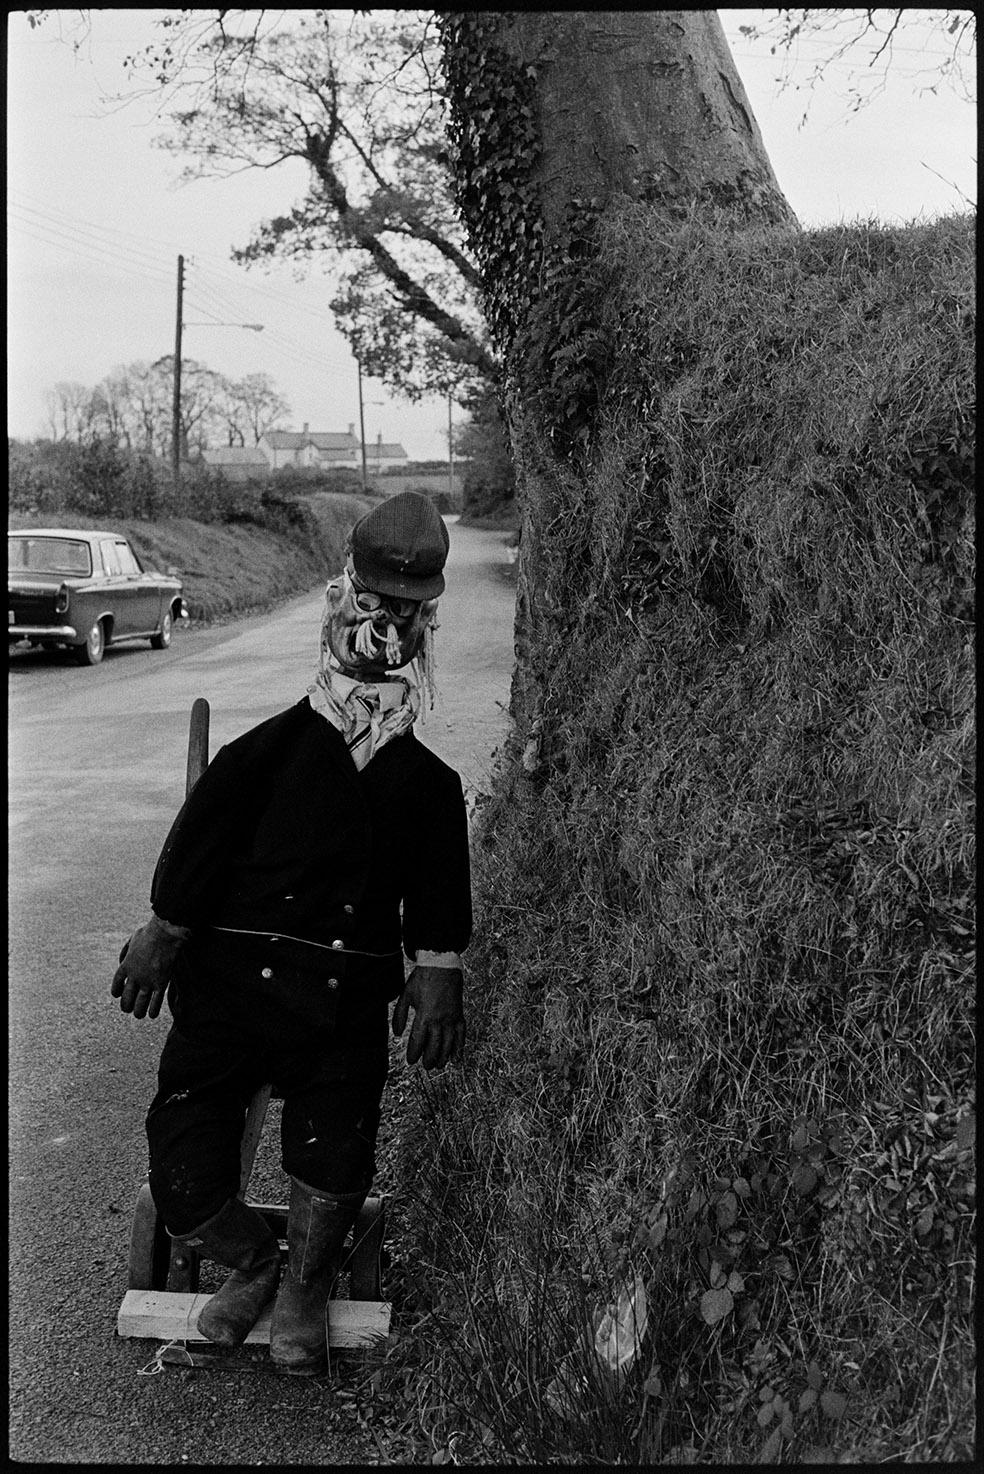 Guy in village street - Guy Fawkes, Ashreigney, October 1975